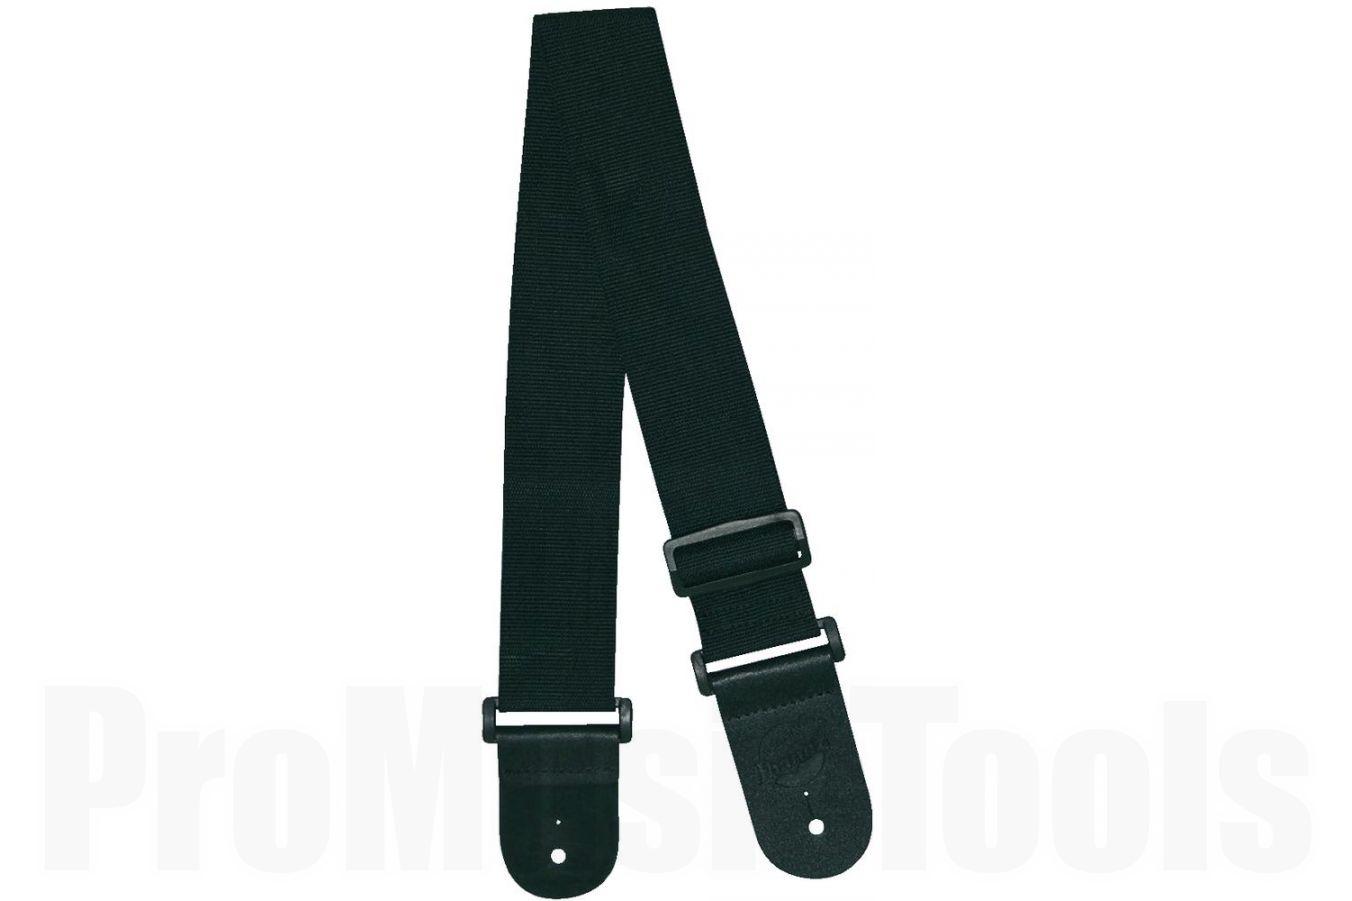 Ibanez GS61-BK Guitar Strap - Black